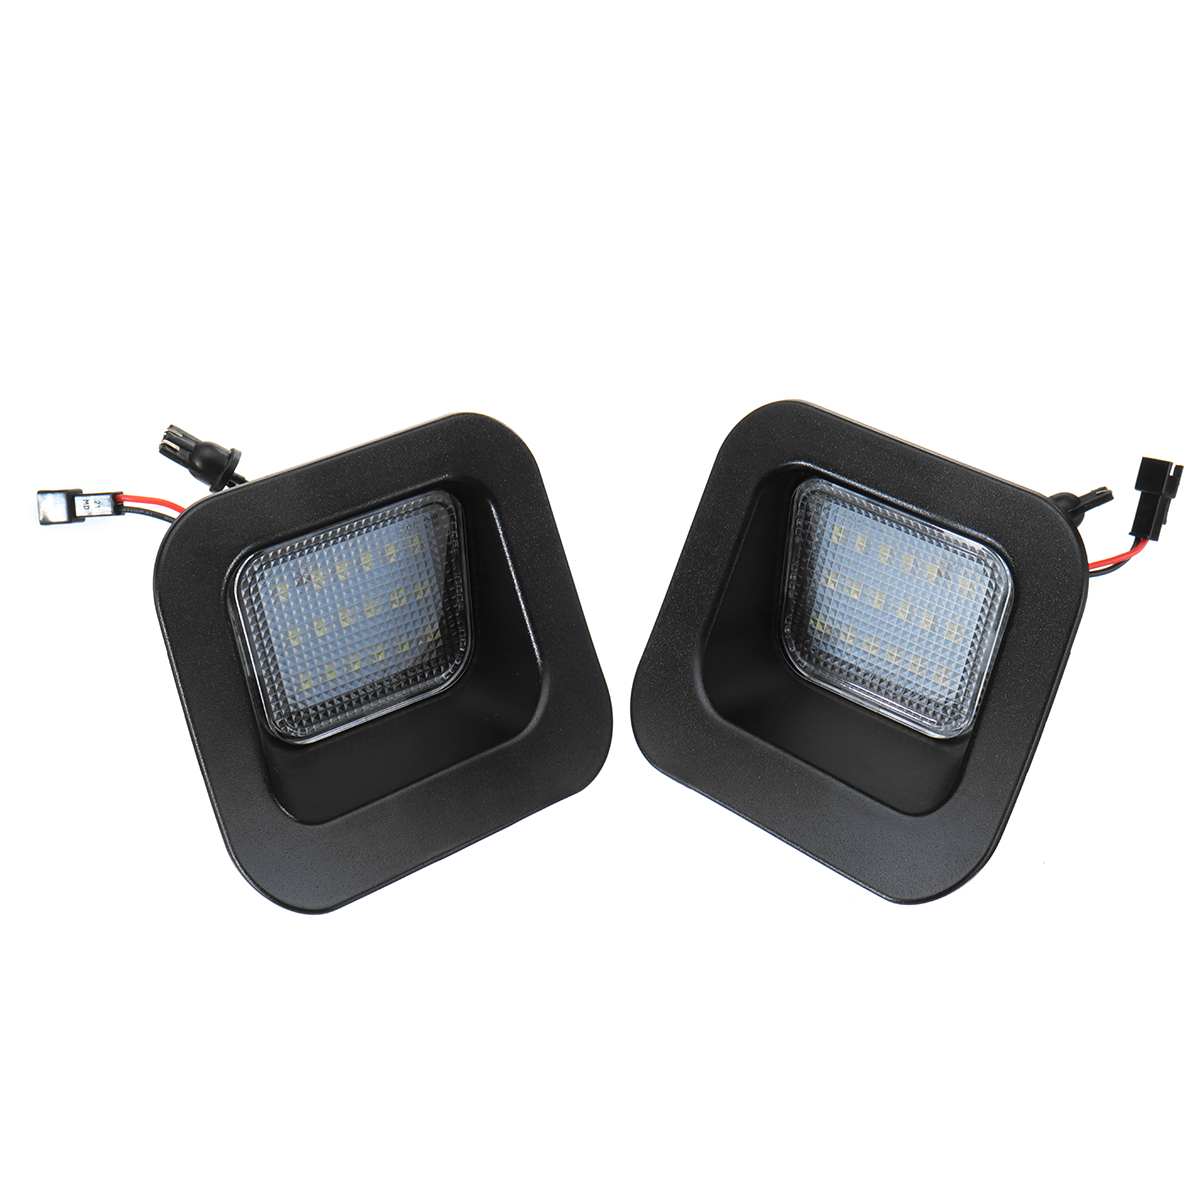 Pair LED License Number Plate Lights White for Dodge RAM 1500 2500 3500 2003-2015